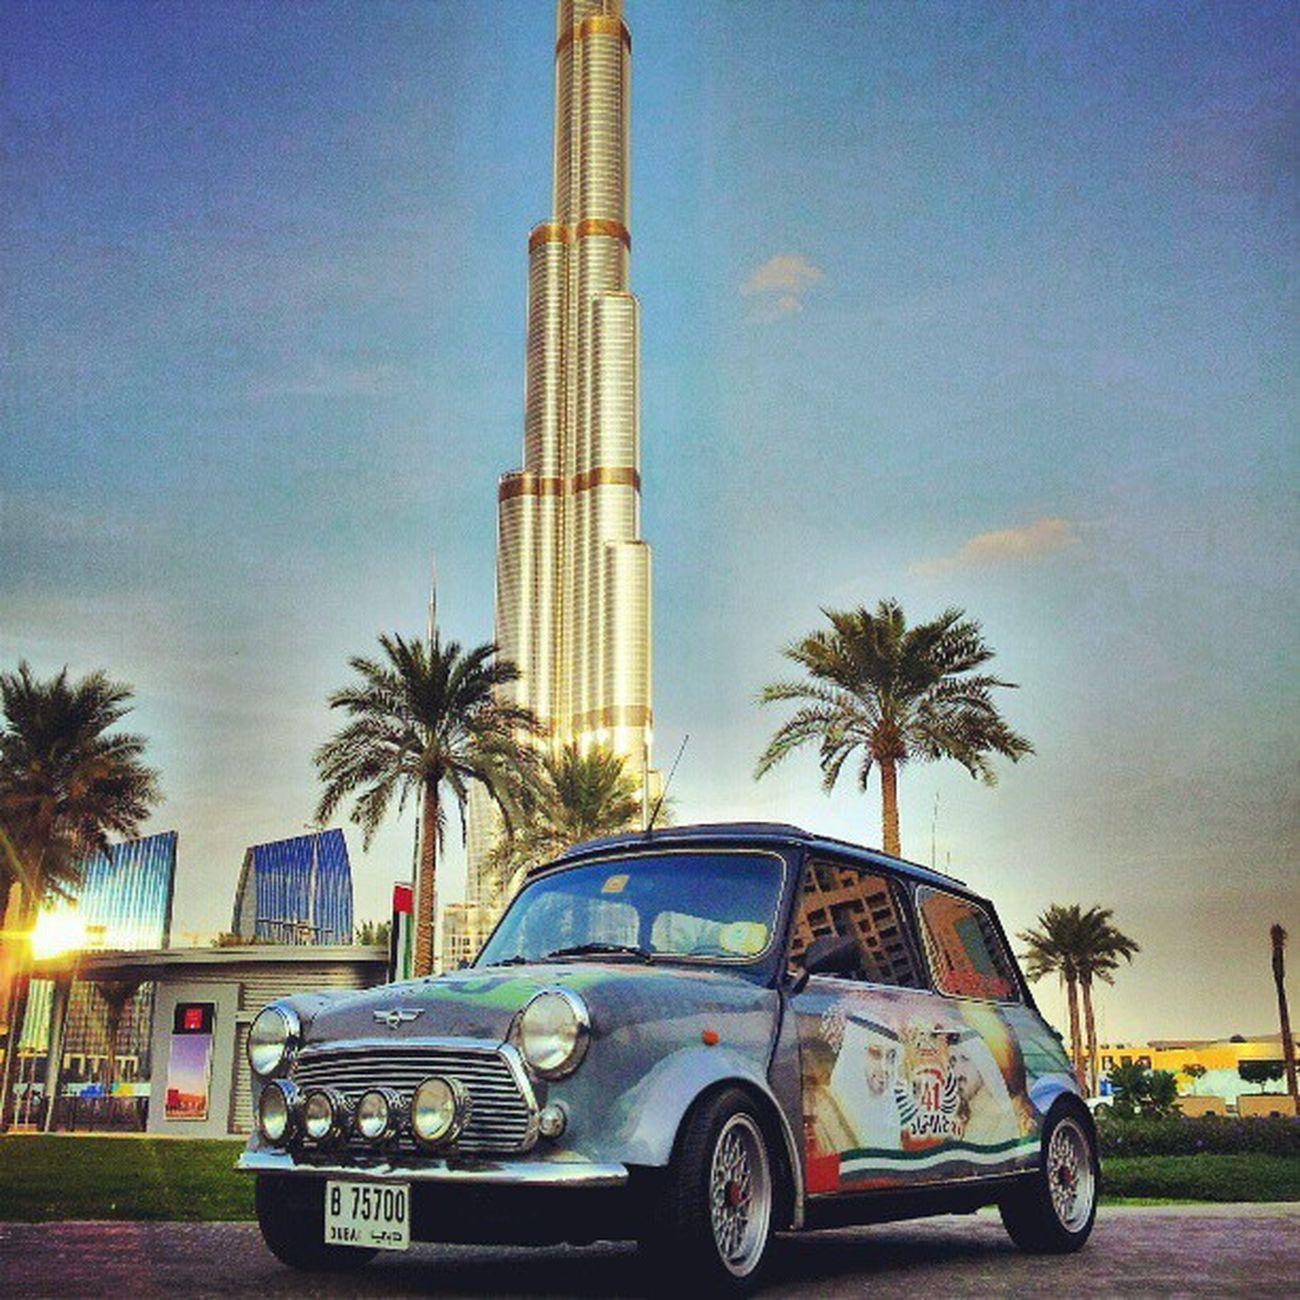 MY MINI MiniCooper Miniclassic Dubaifestivalcentre Downtowndubai dubai dxb dubaiairport unitedarabemirates uae uae41 arabian burj_khalifa bestoftheday beautiful bestofheday pictureoftheday photooftheday princess photographer